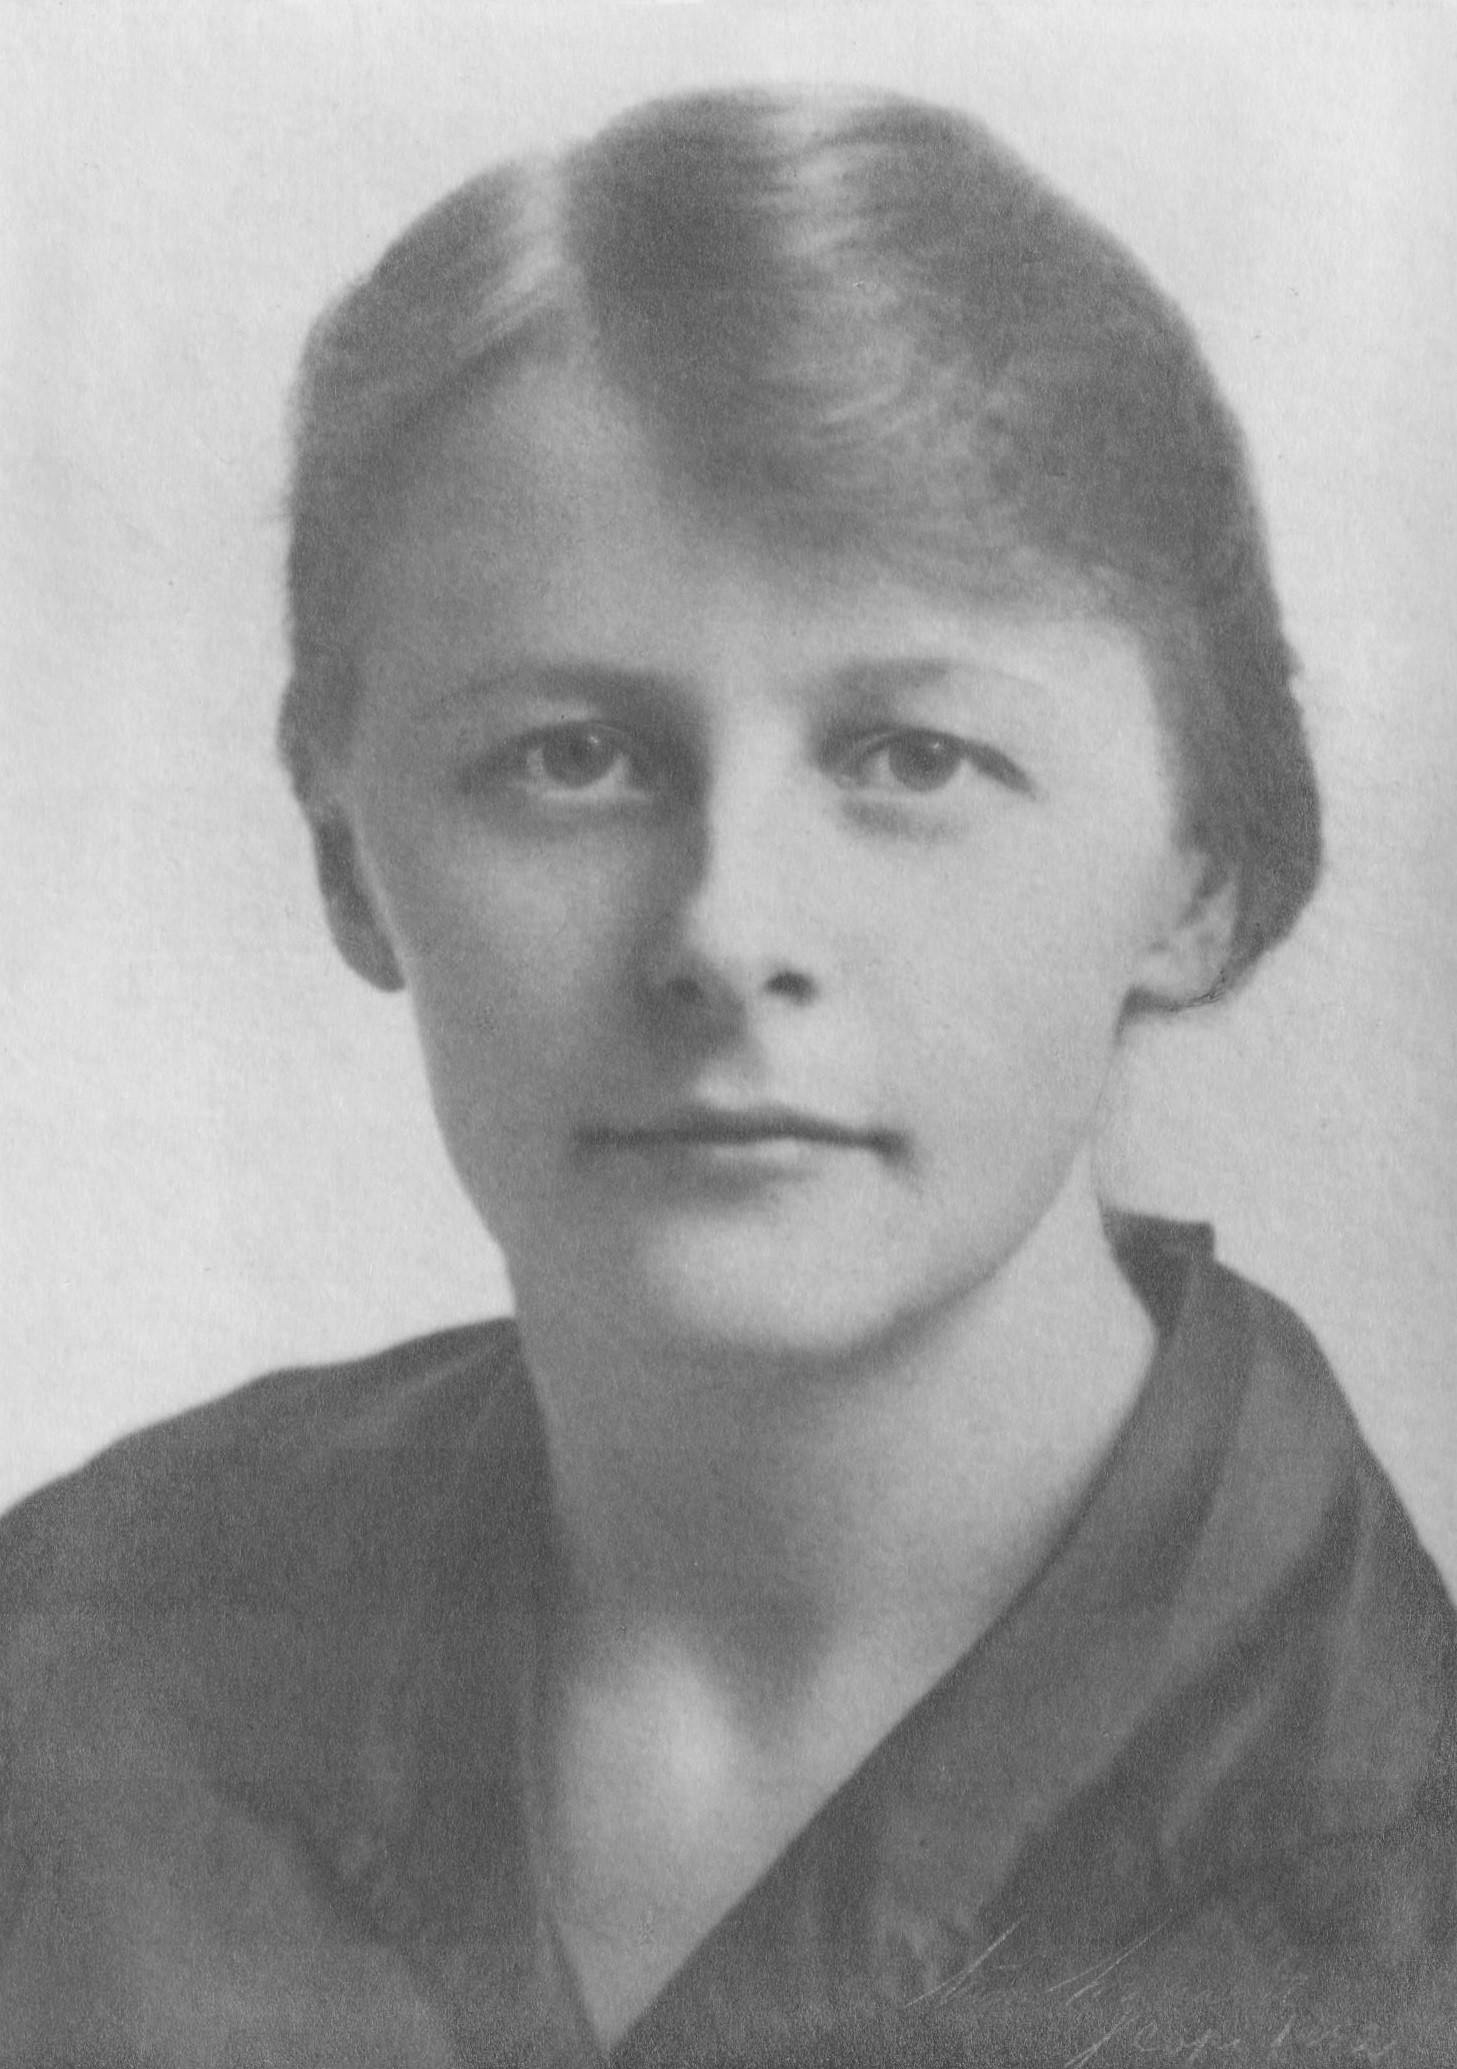 Dorthea Kirstine Jensen